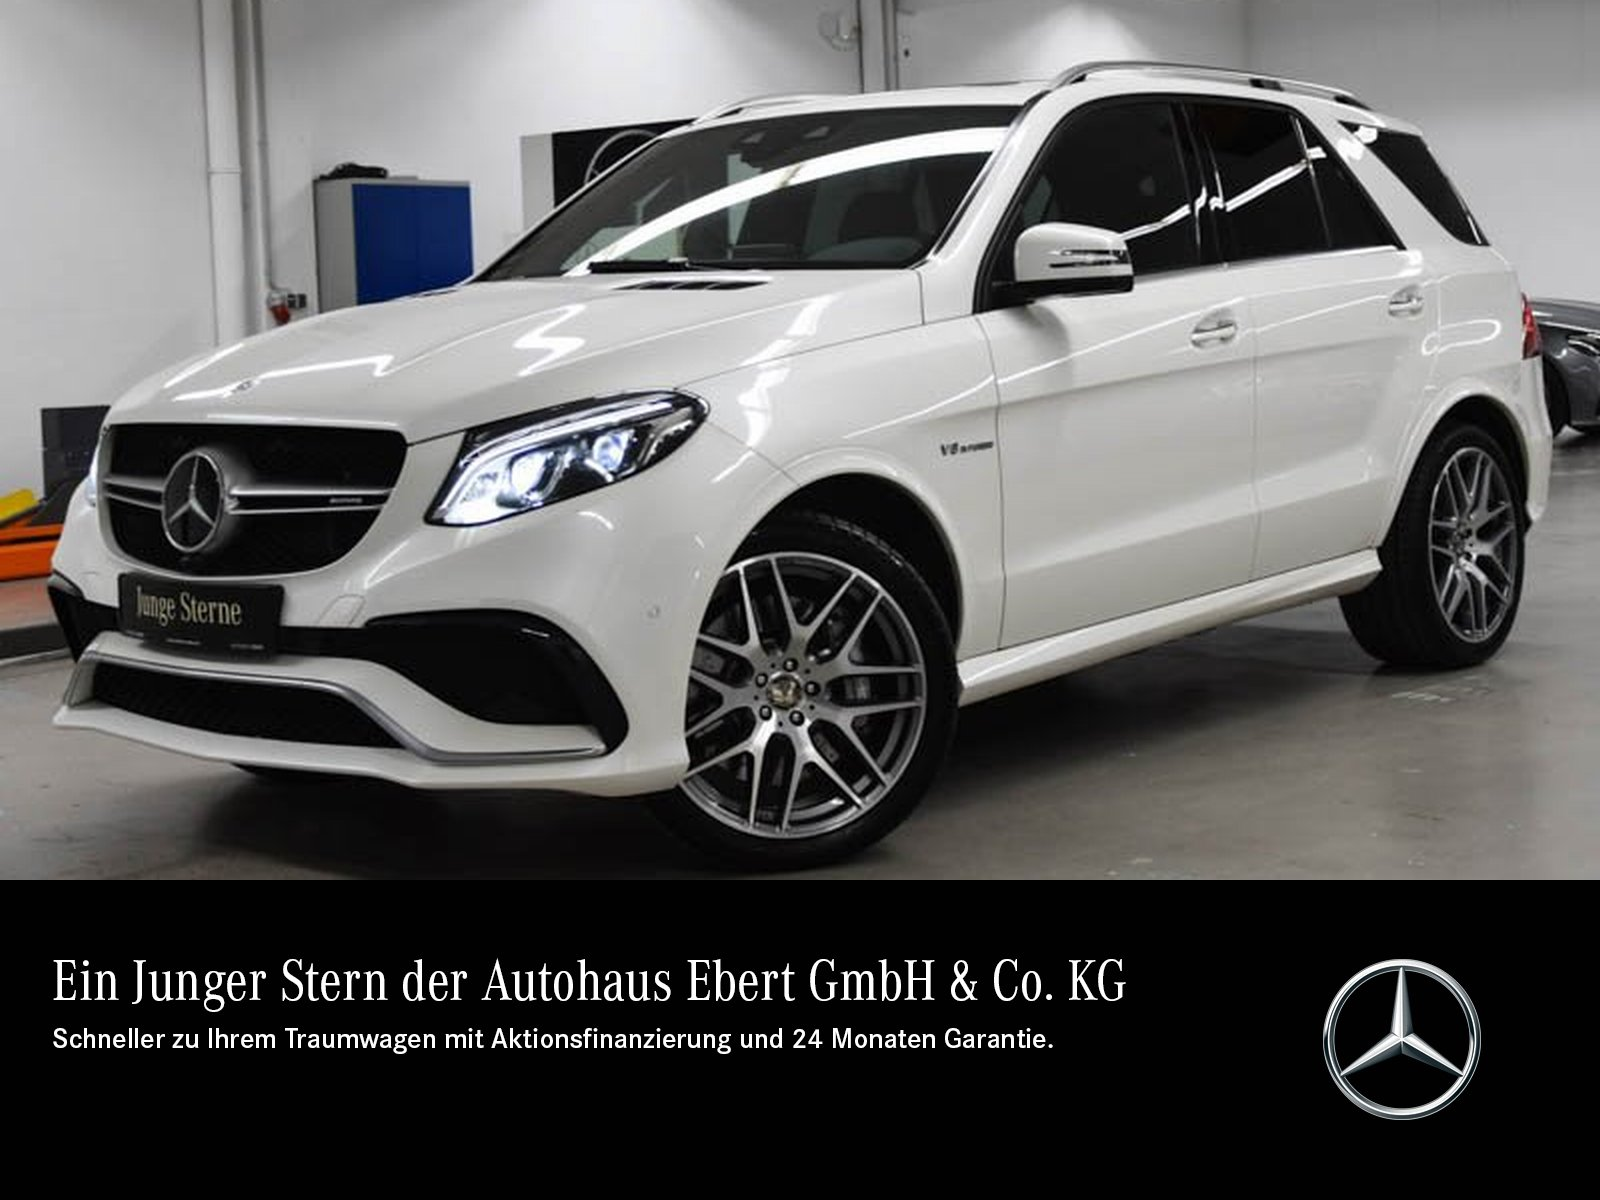 Mercedes-Benz GLE 63 AMG DRIVER'S+COMAND+AIRM+AHK+SITZKLIMA, Jahr 2016, Benzin